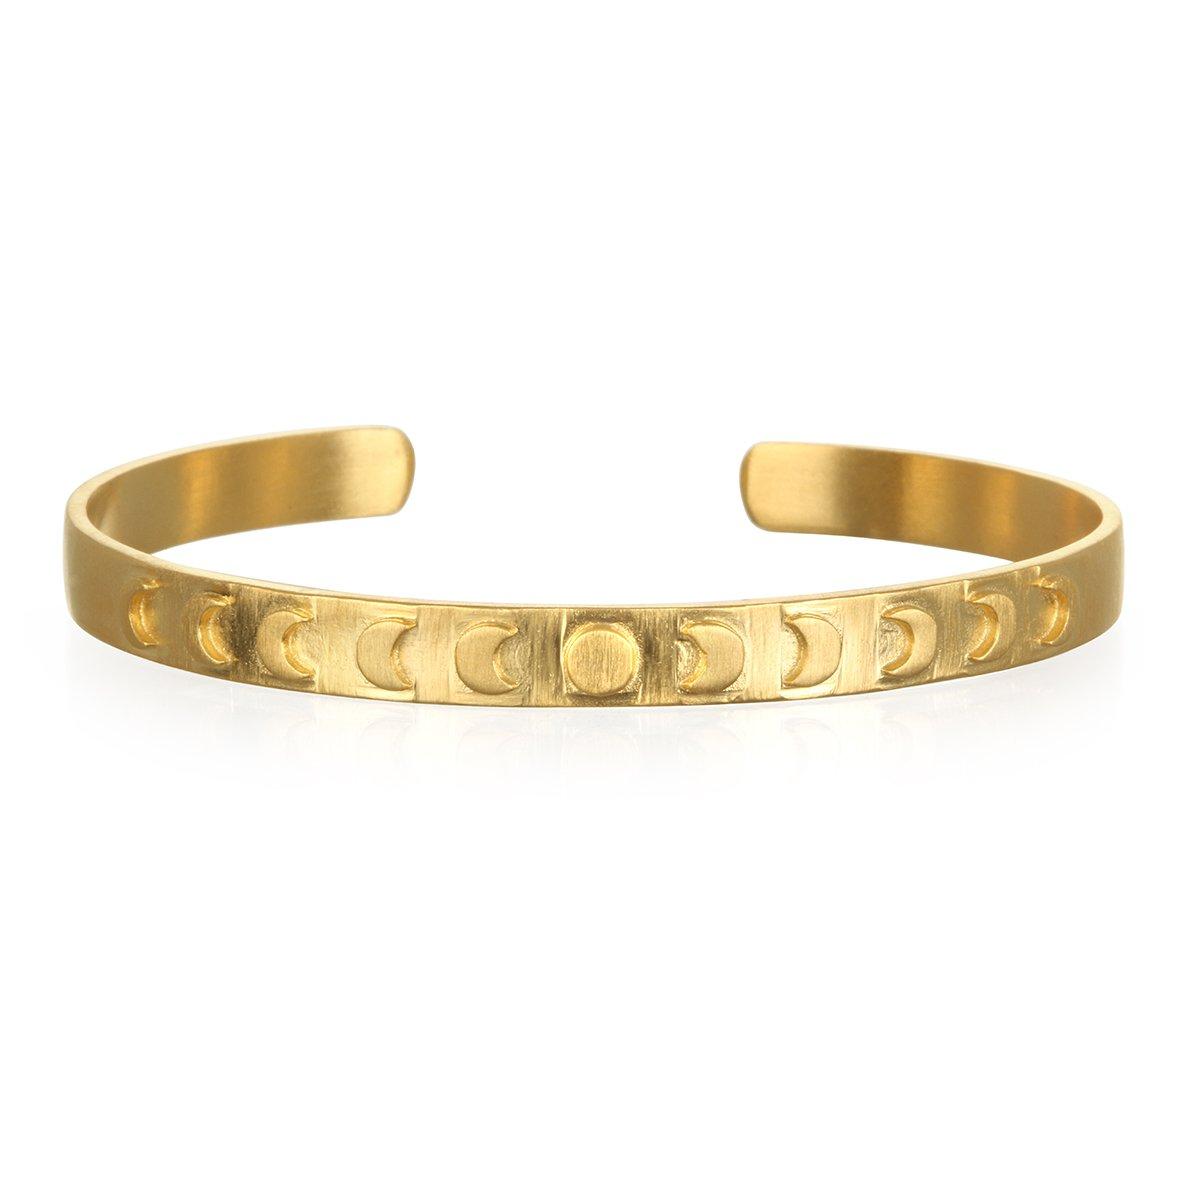 Satya Jewelry Gold Plate Moon Phase Cuff Bracelet